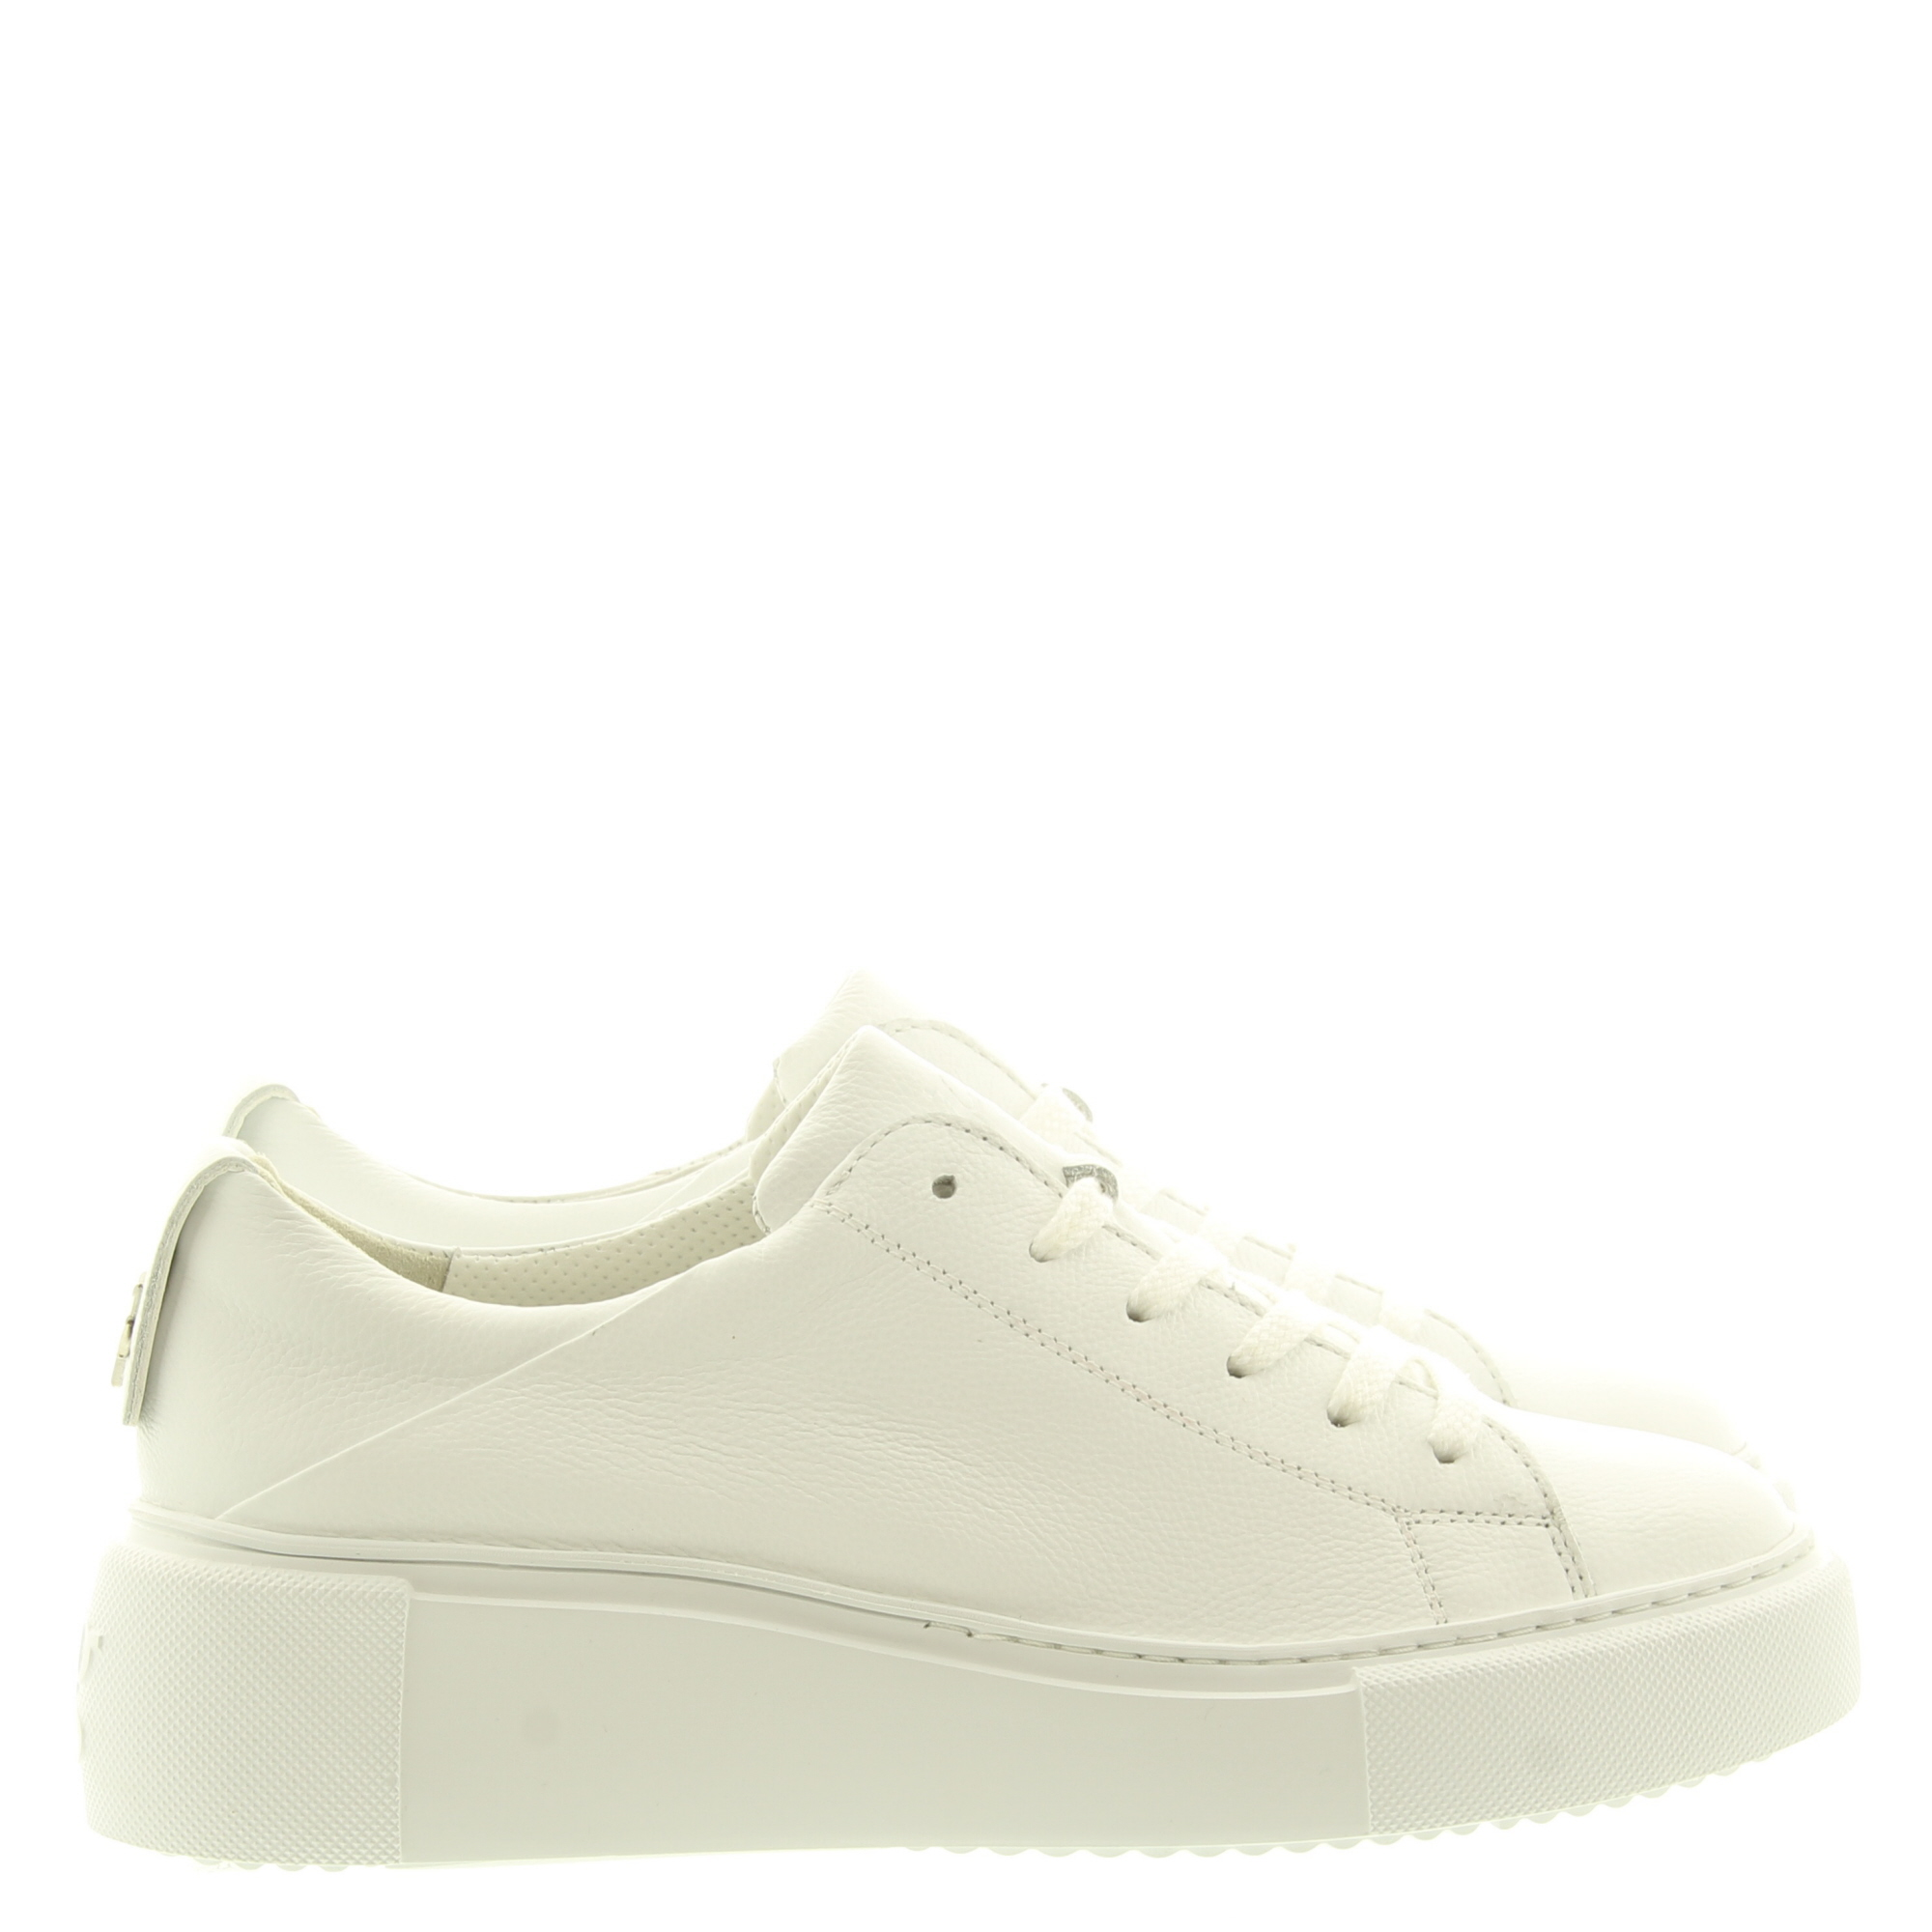 Paul Green 4836 088 White